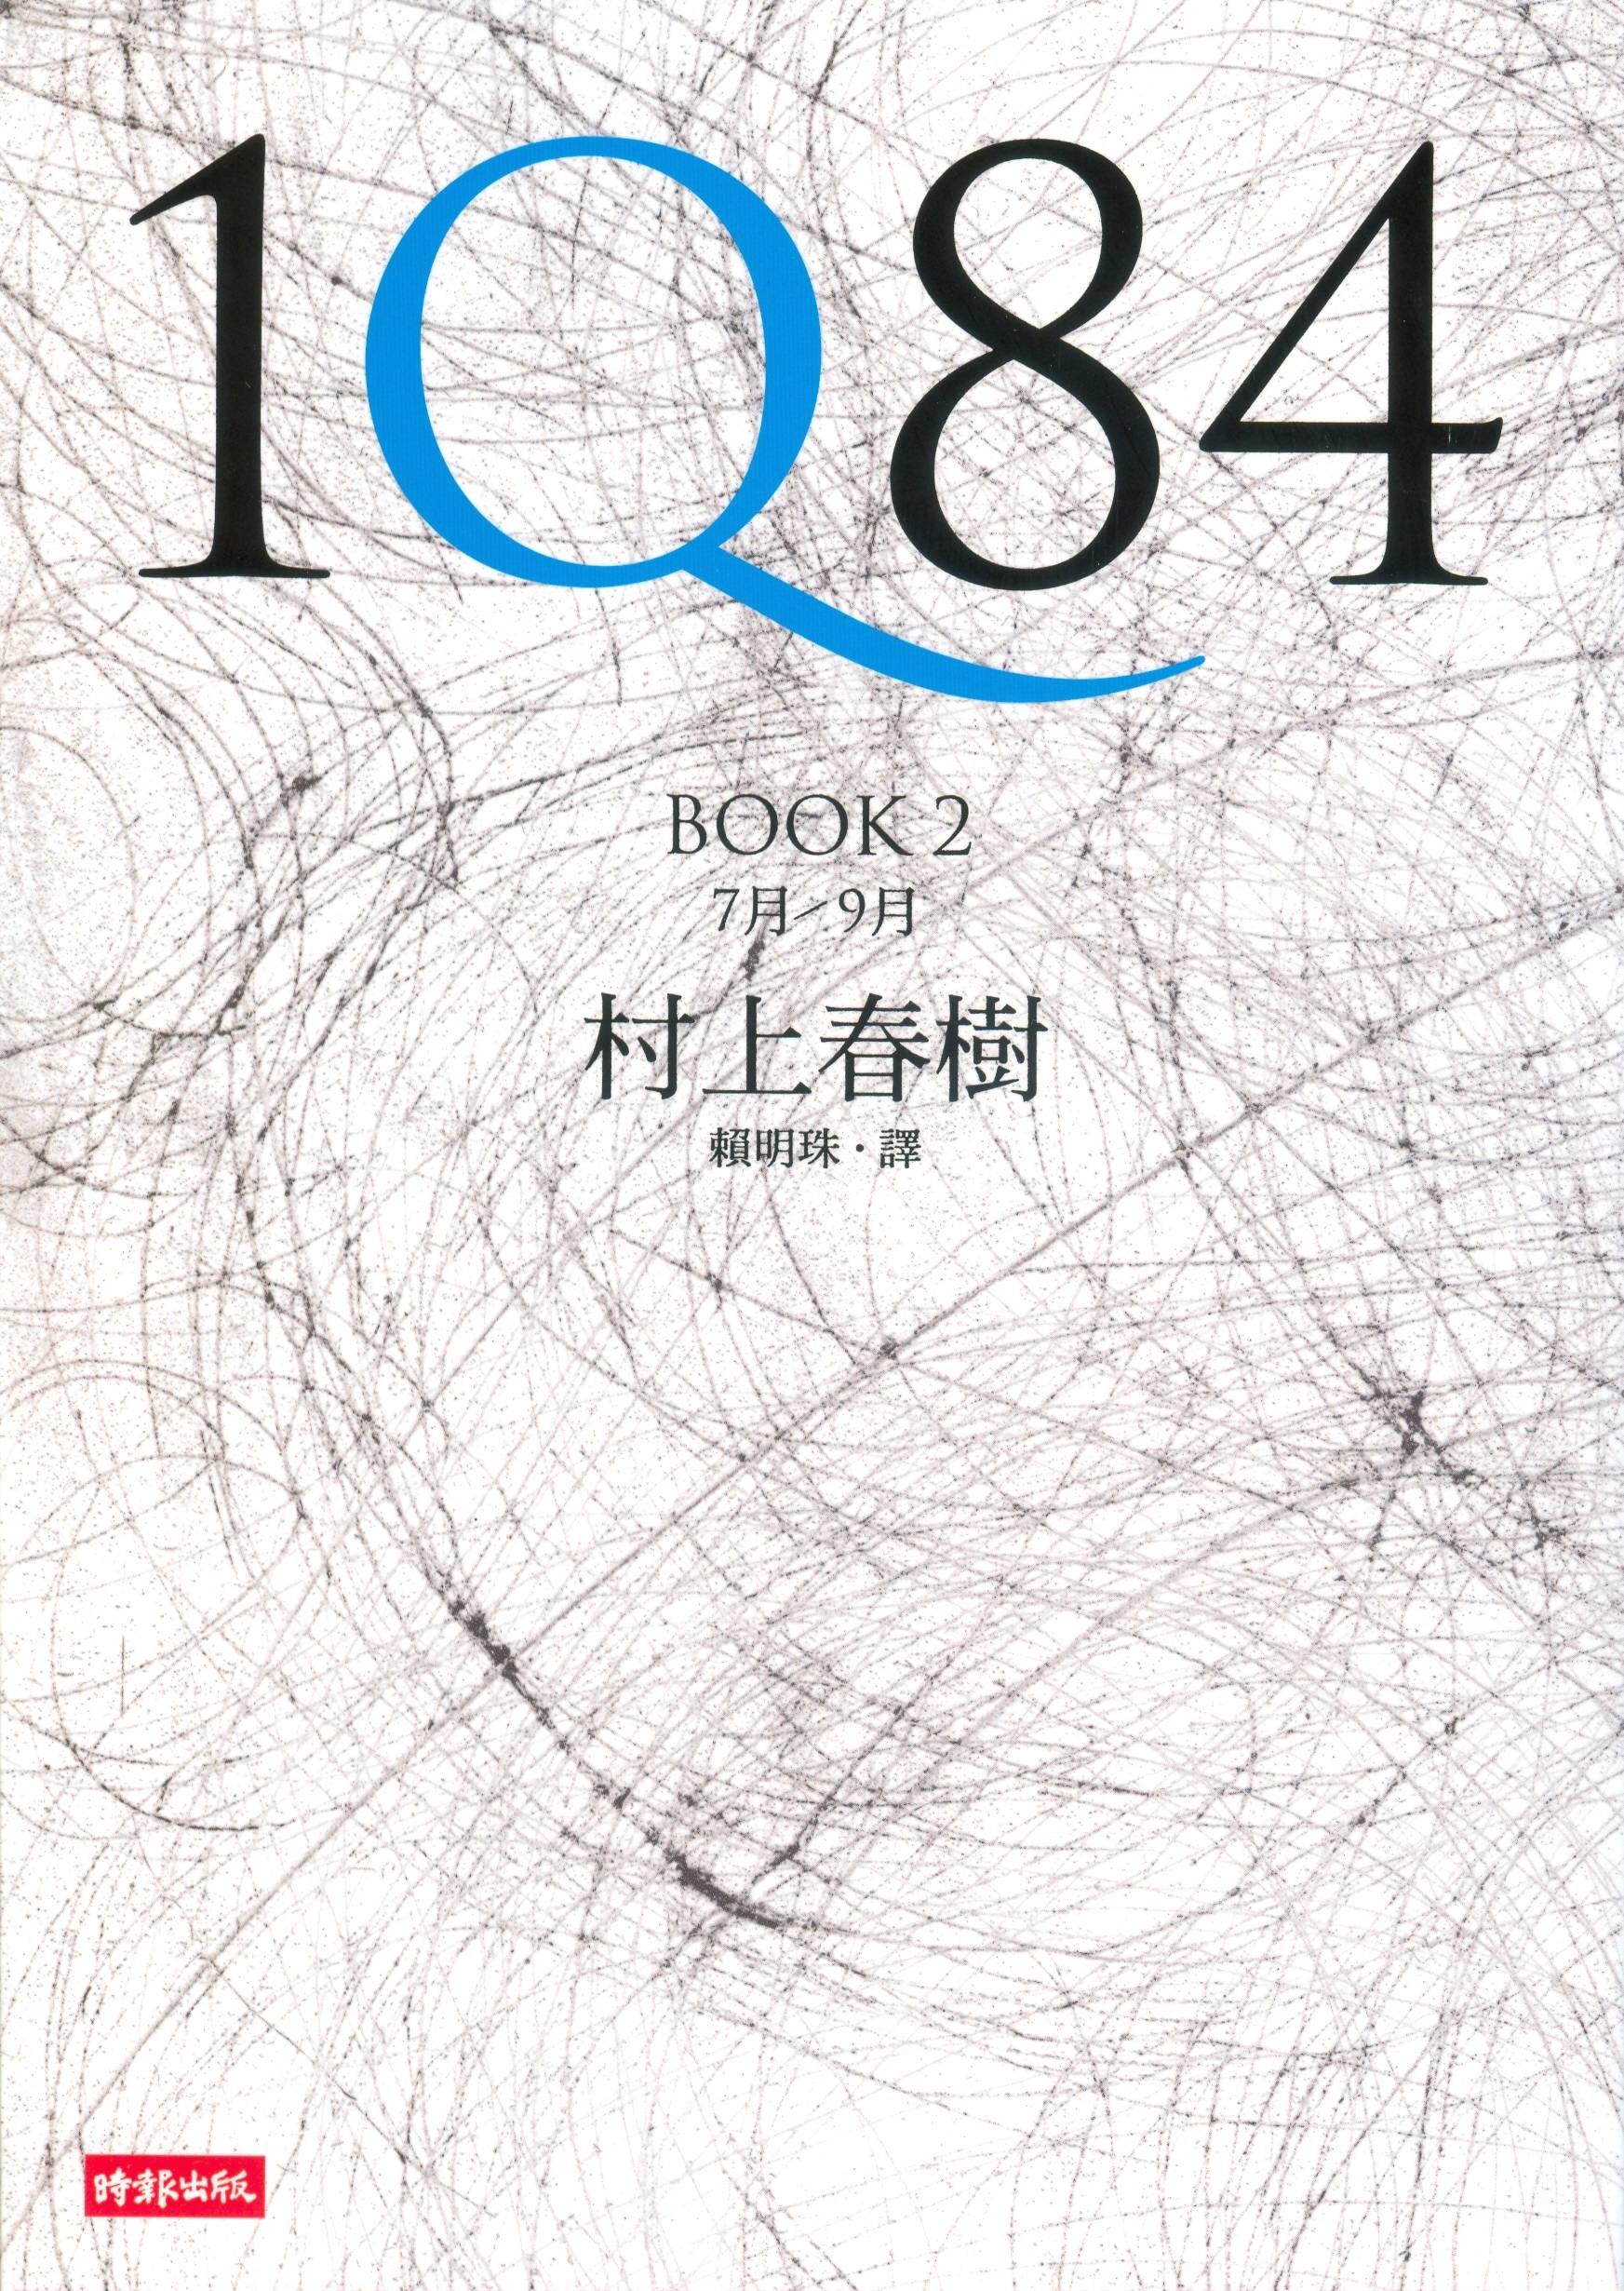 1Q84(BOOK2)